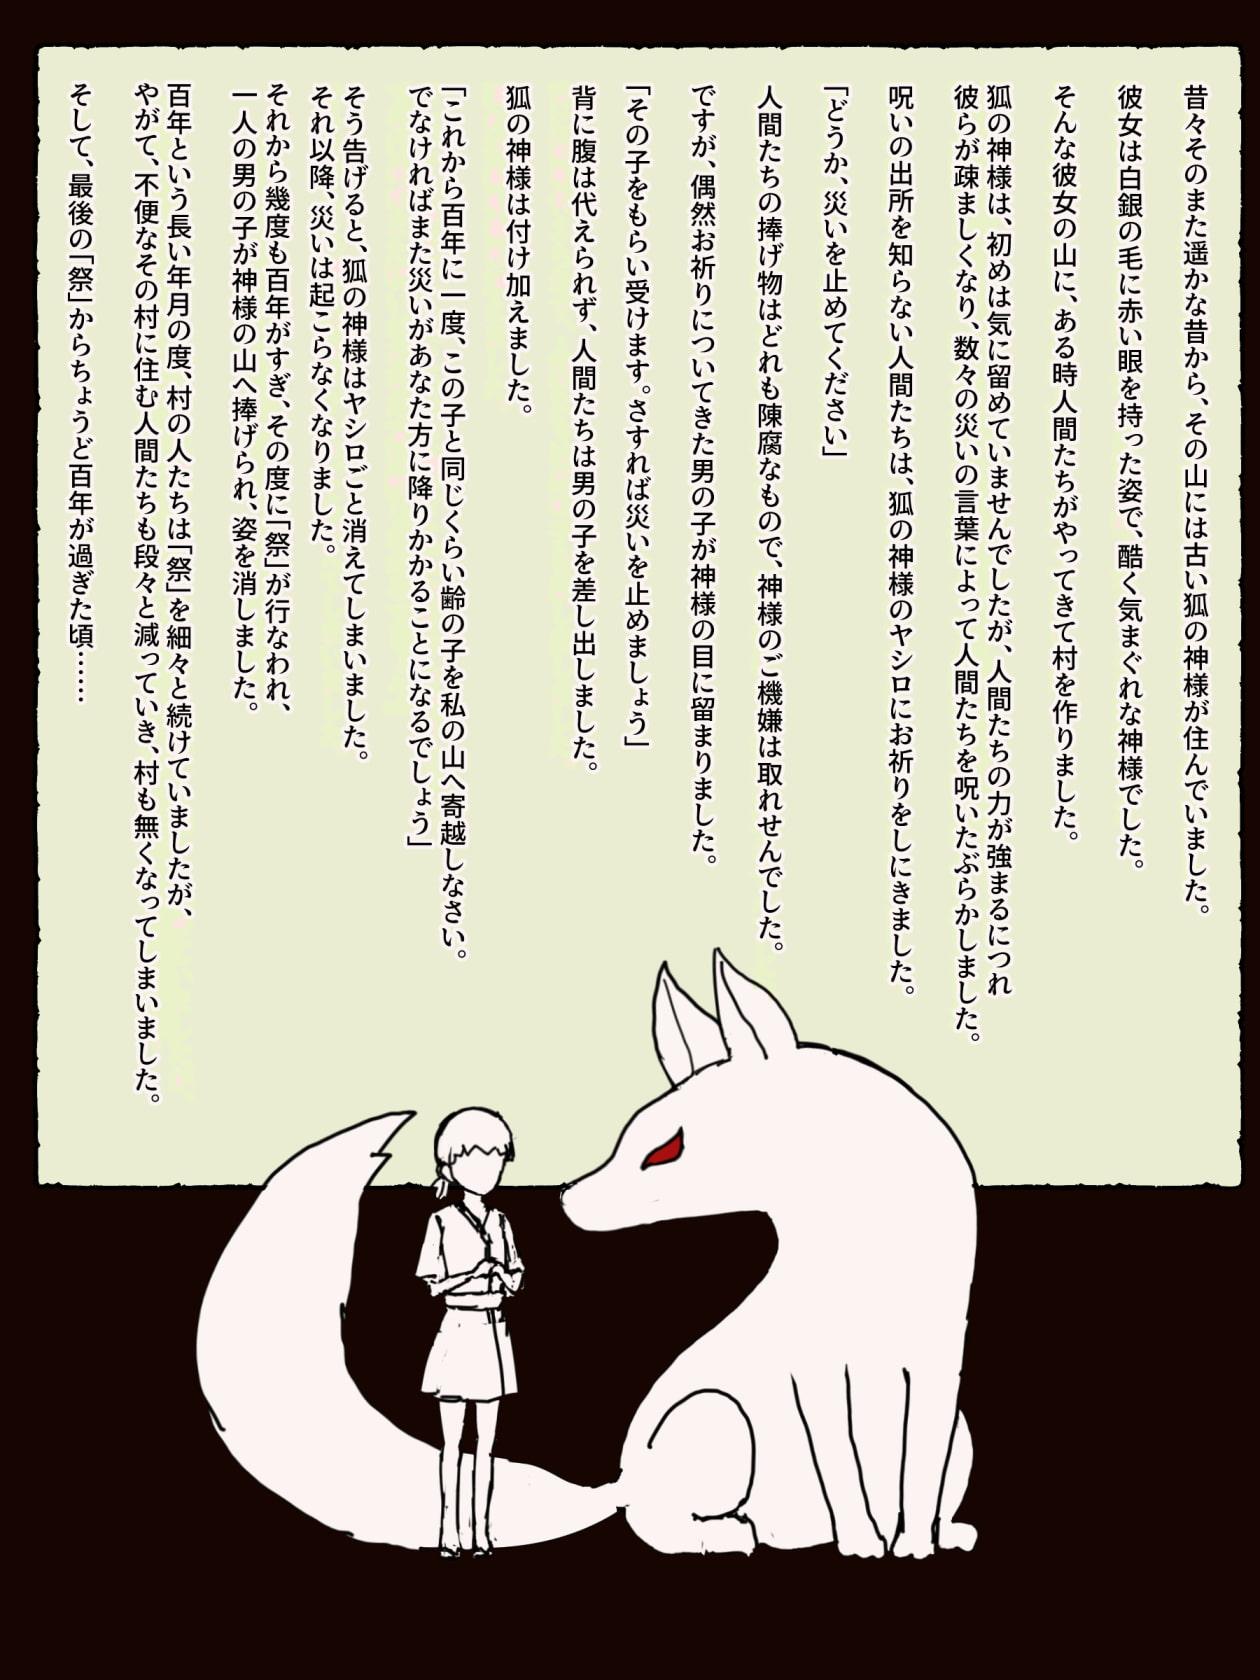 RJ329768 狐神に見初められた少年の話 [20210603]